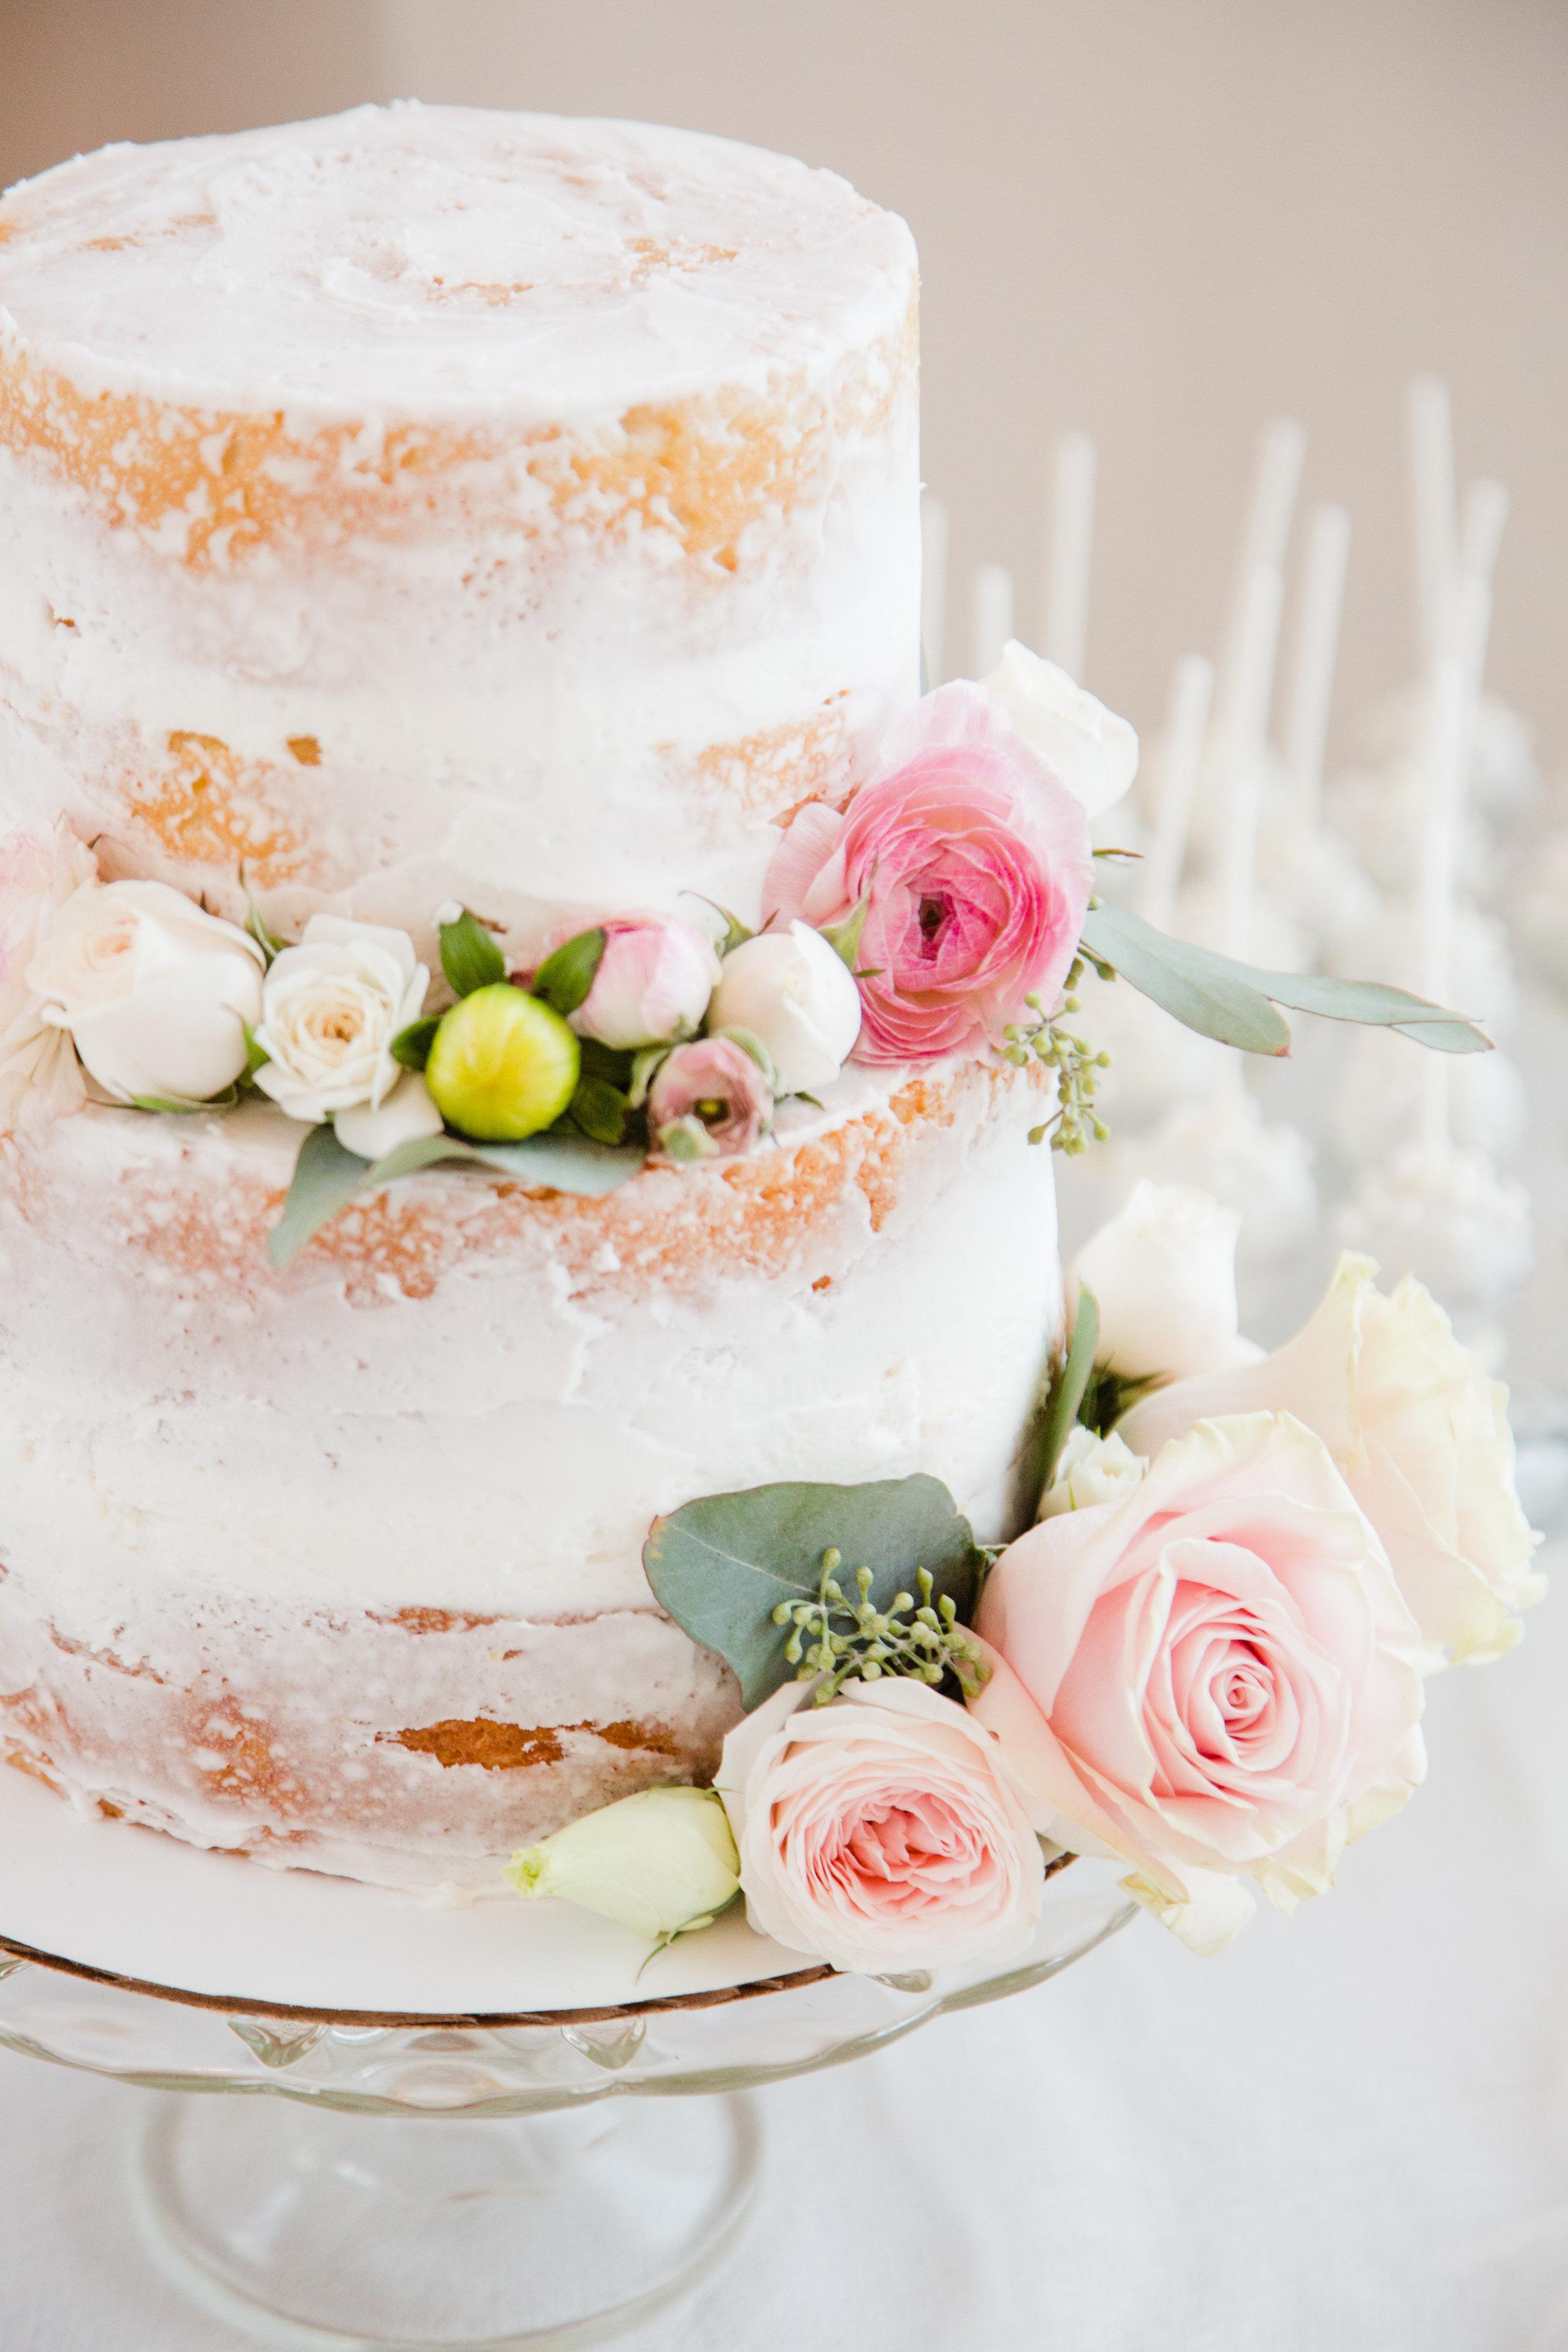 A_Floral_Affair_Gardnerville_Tahoe_Reno_Wedding_Florist_Reception_Cake (2)